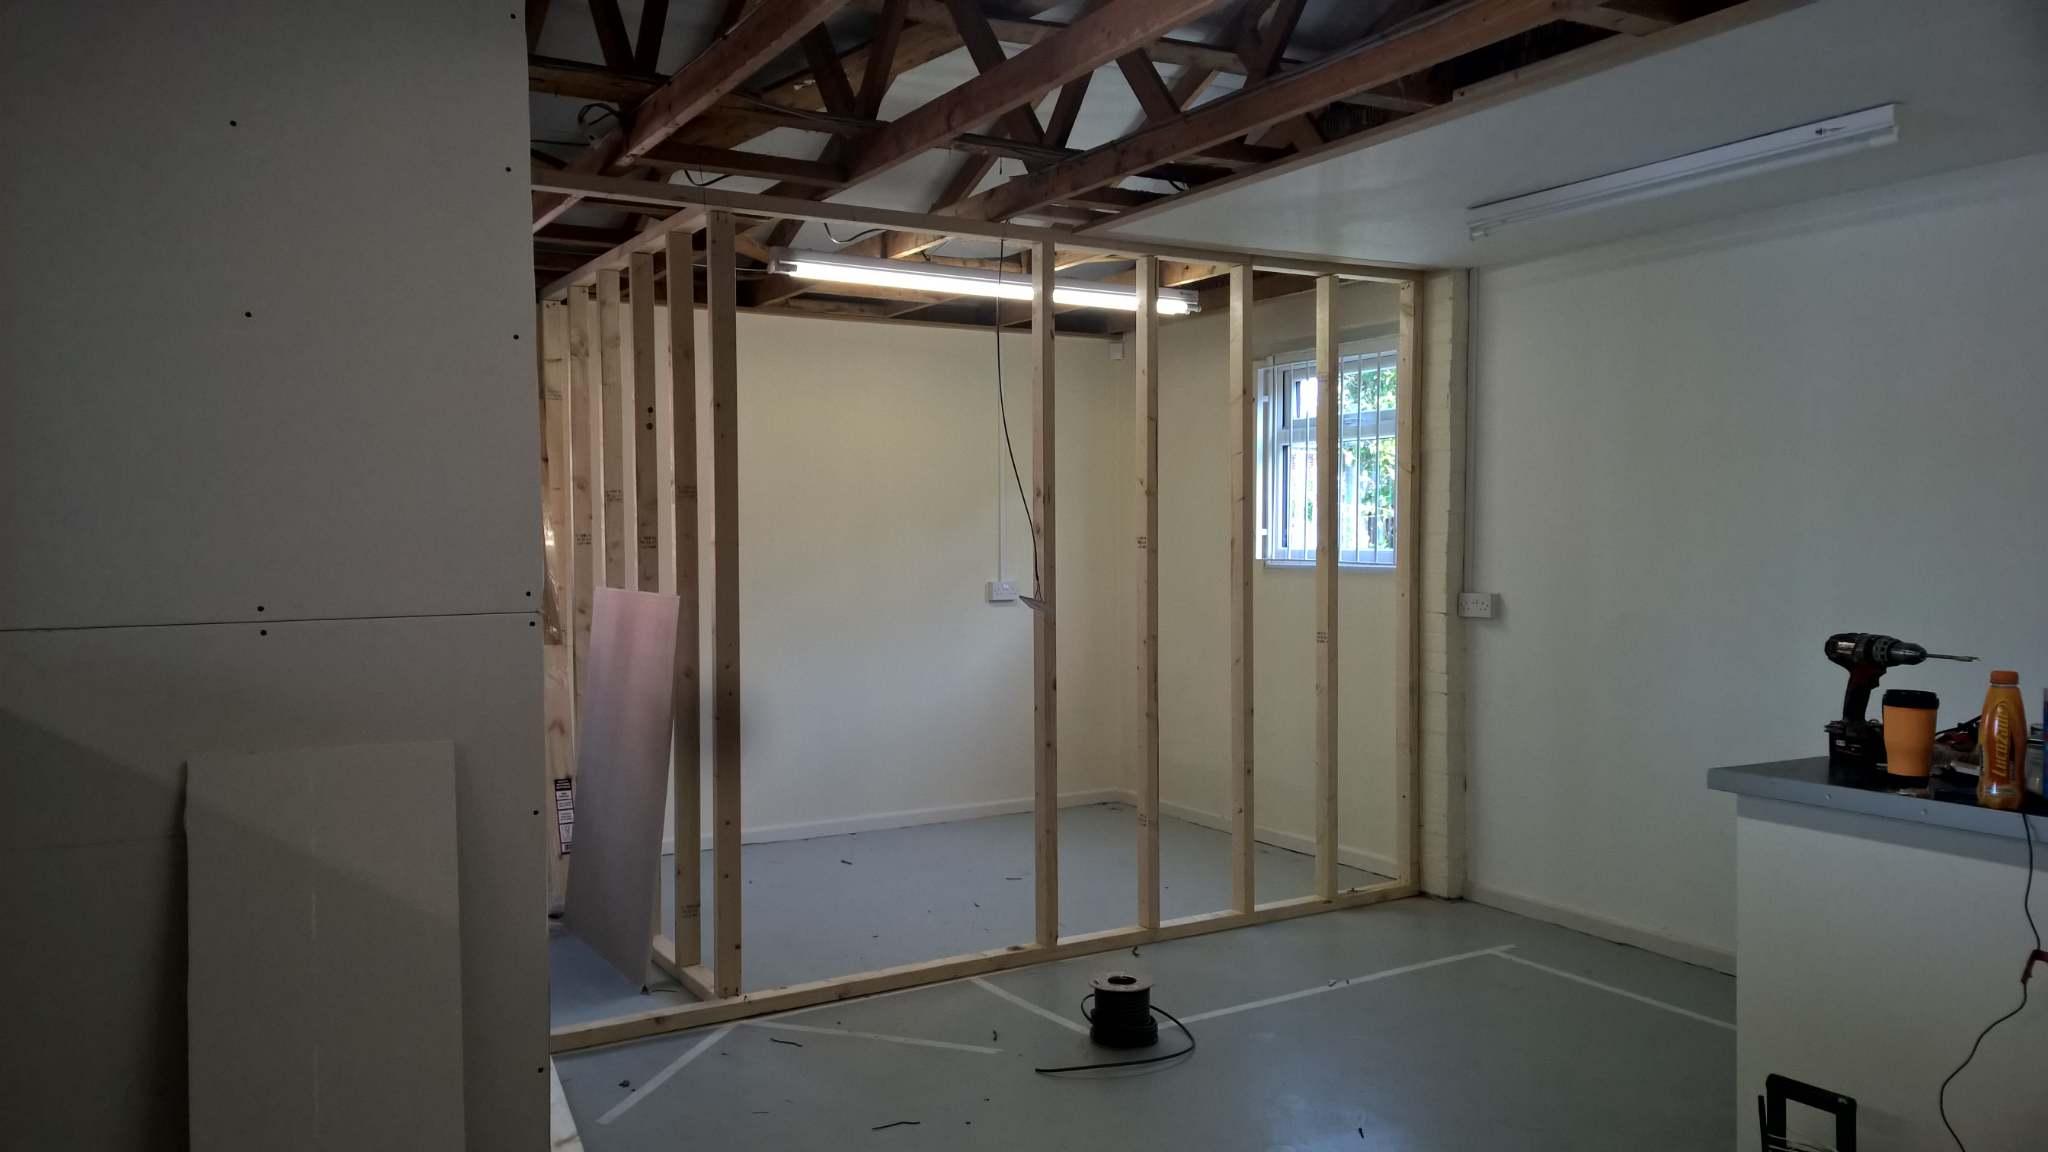 Unfinished quarantine room